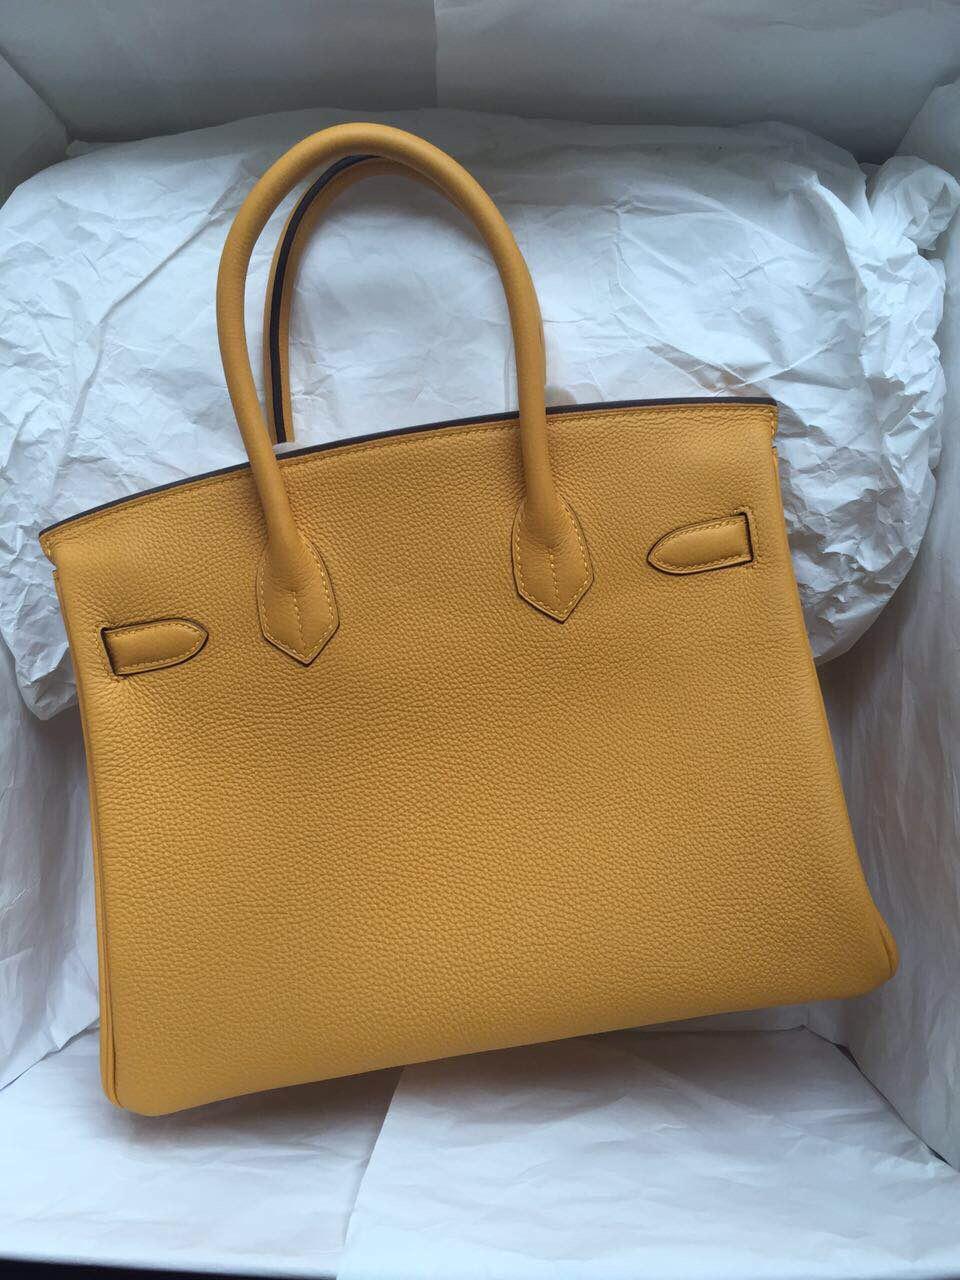 Discount Hermes Birkin Bag Mustard Yellow Togo Leather Tote Handbag 30cm